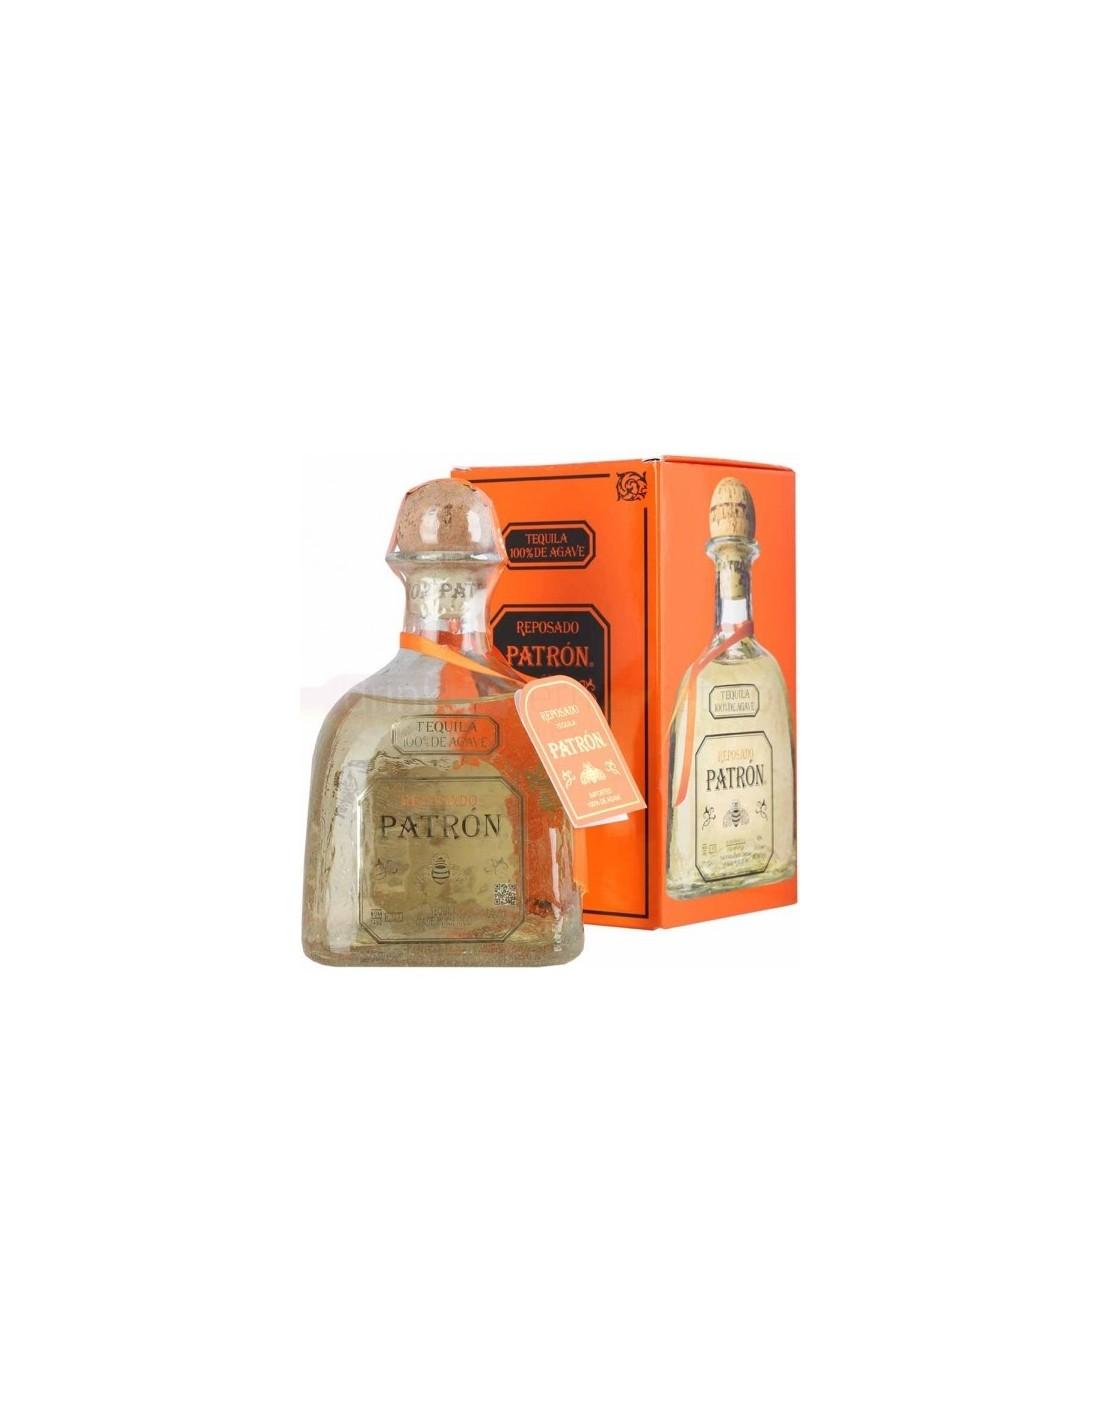 Tequila Patron Reposado 0.7L, 40% alc., Mexic